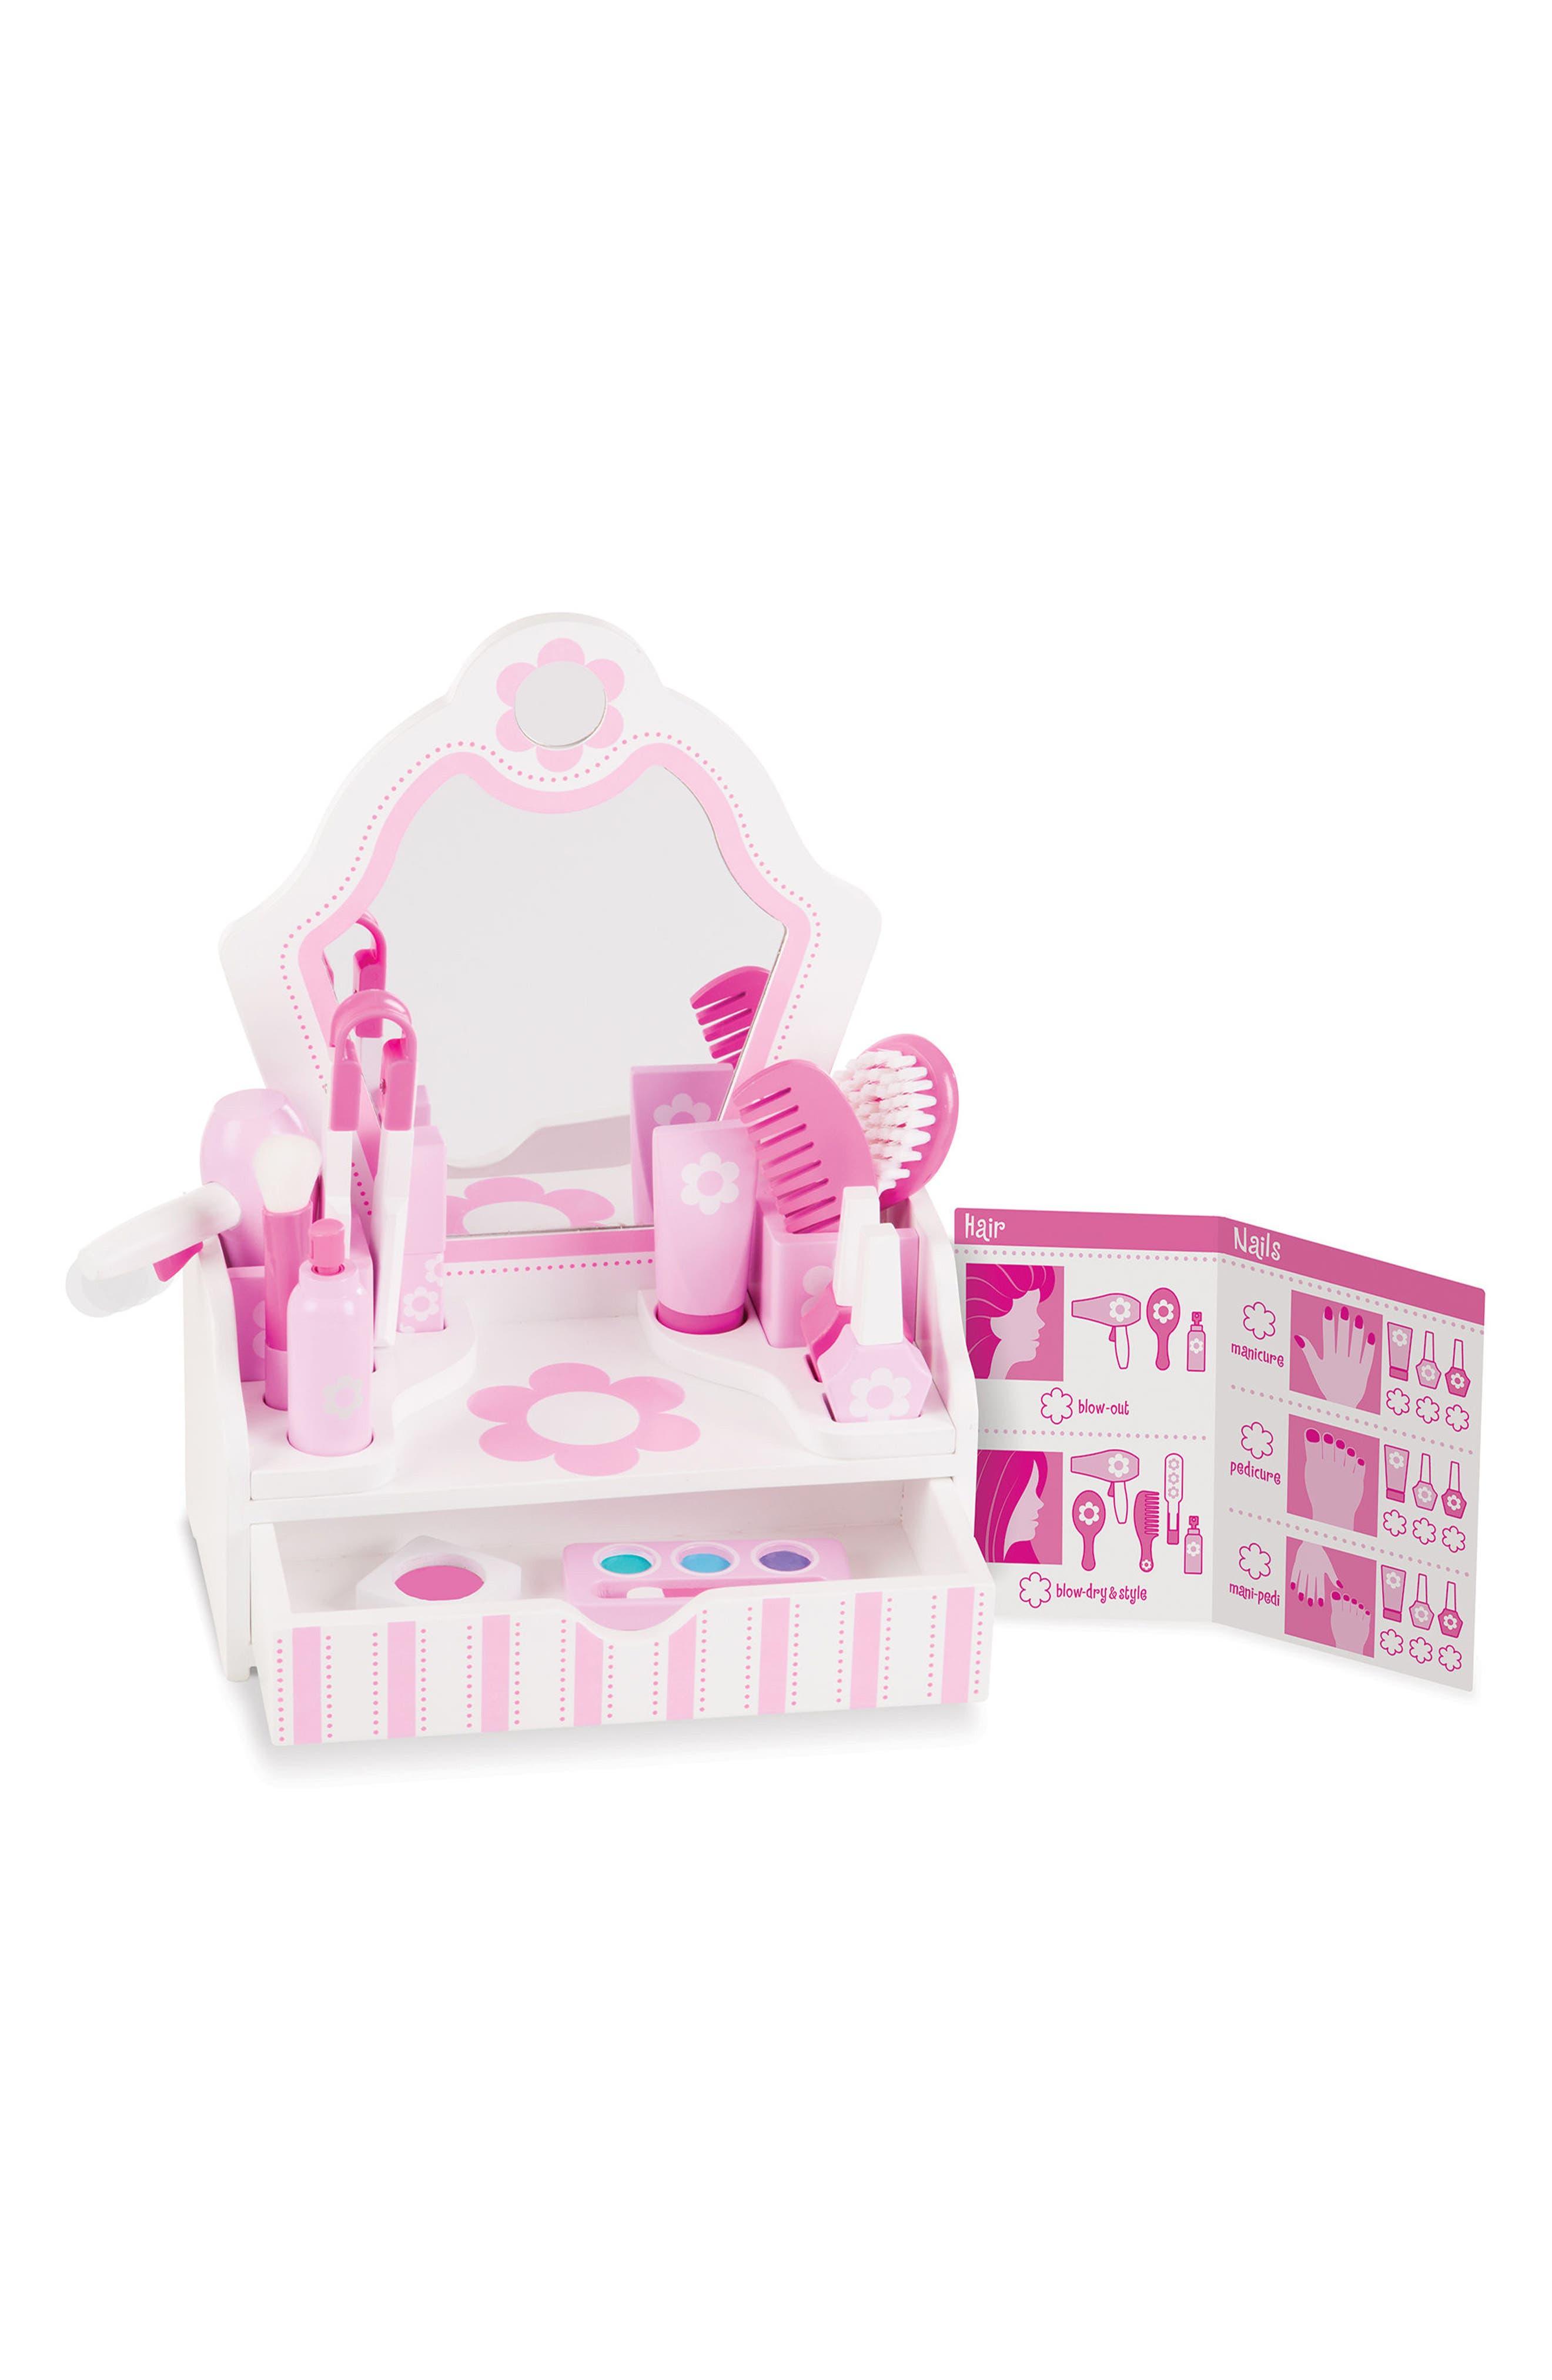 Vanity Play Set,                             Main thumbnail 1, color,                             Pink Multi